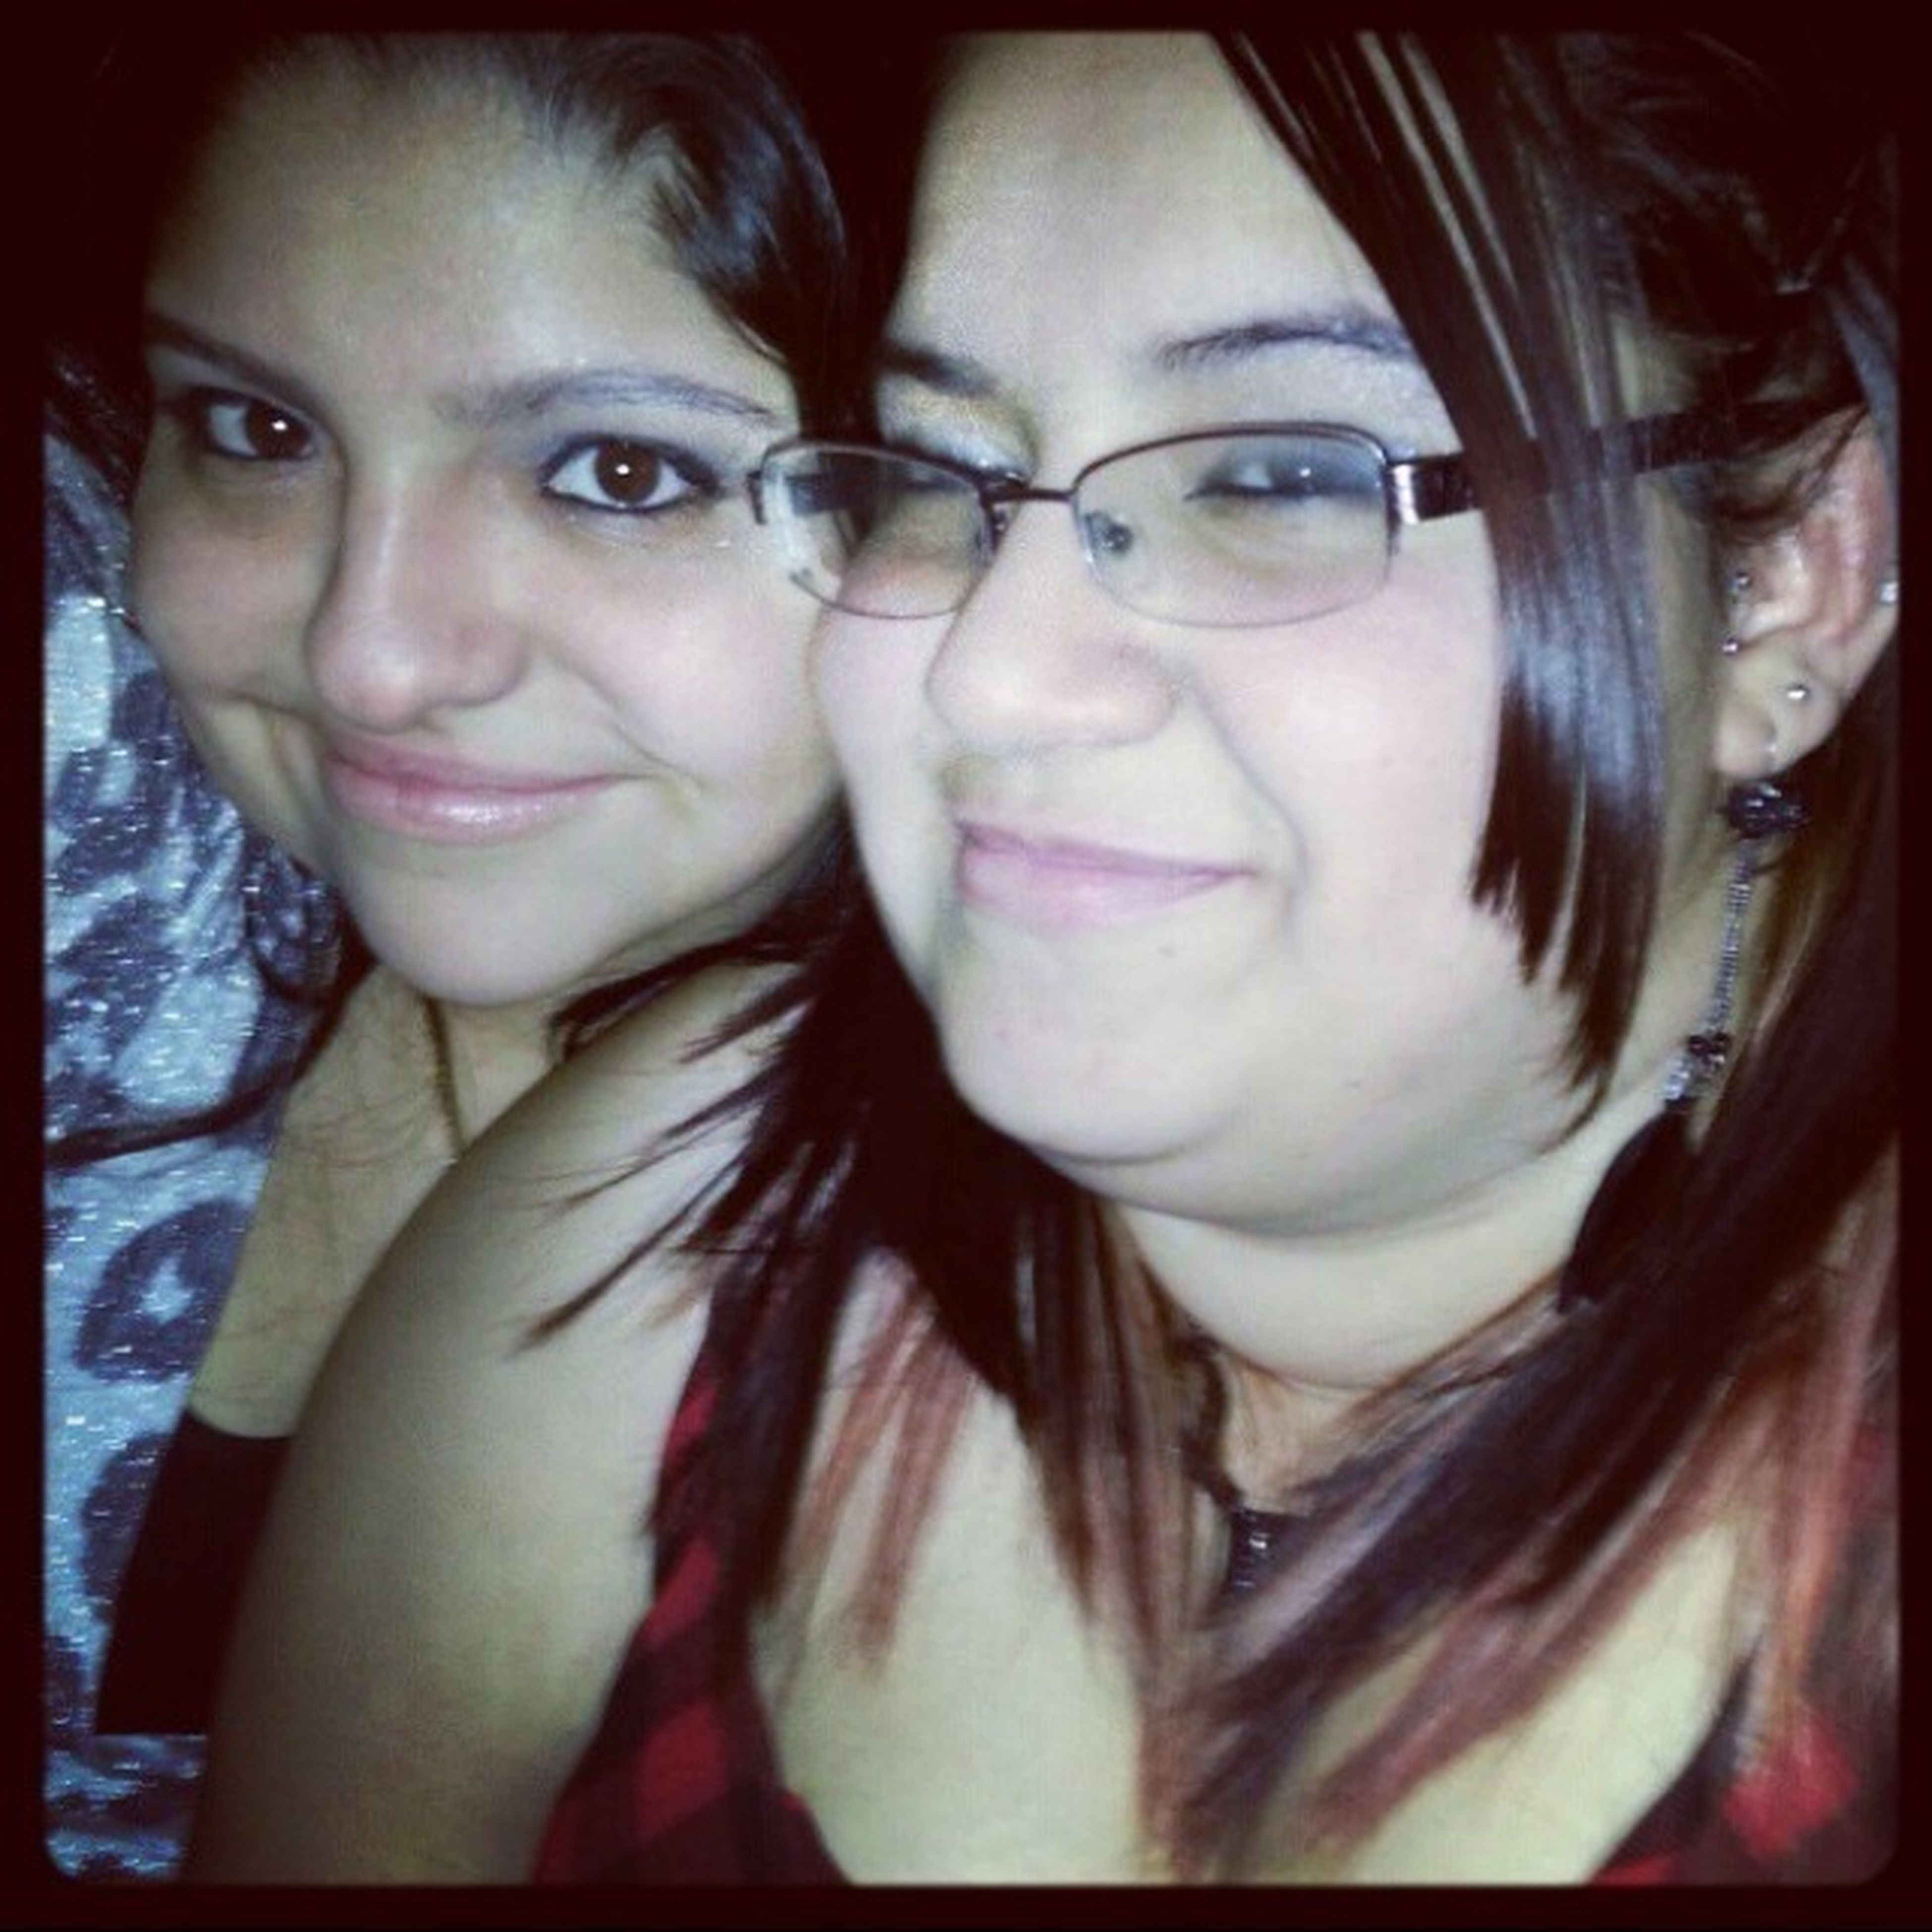 My Bestfriend / Sister